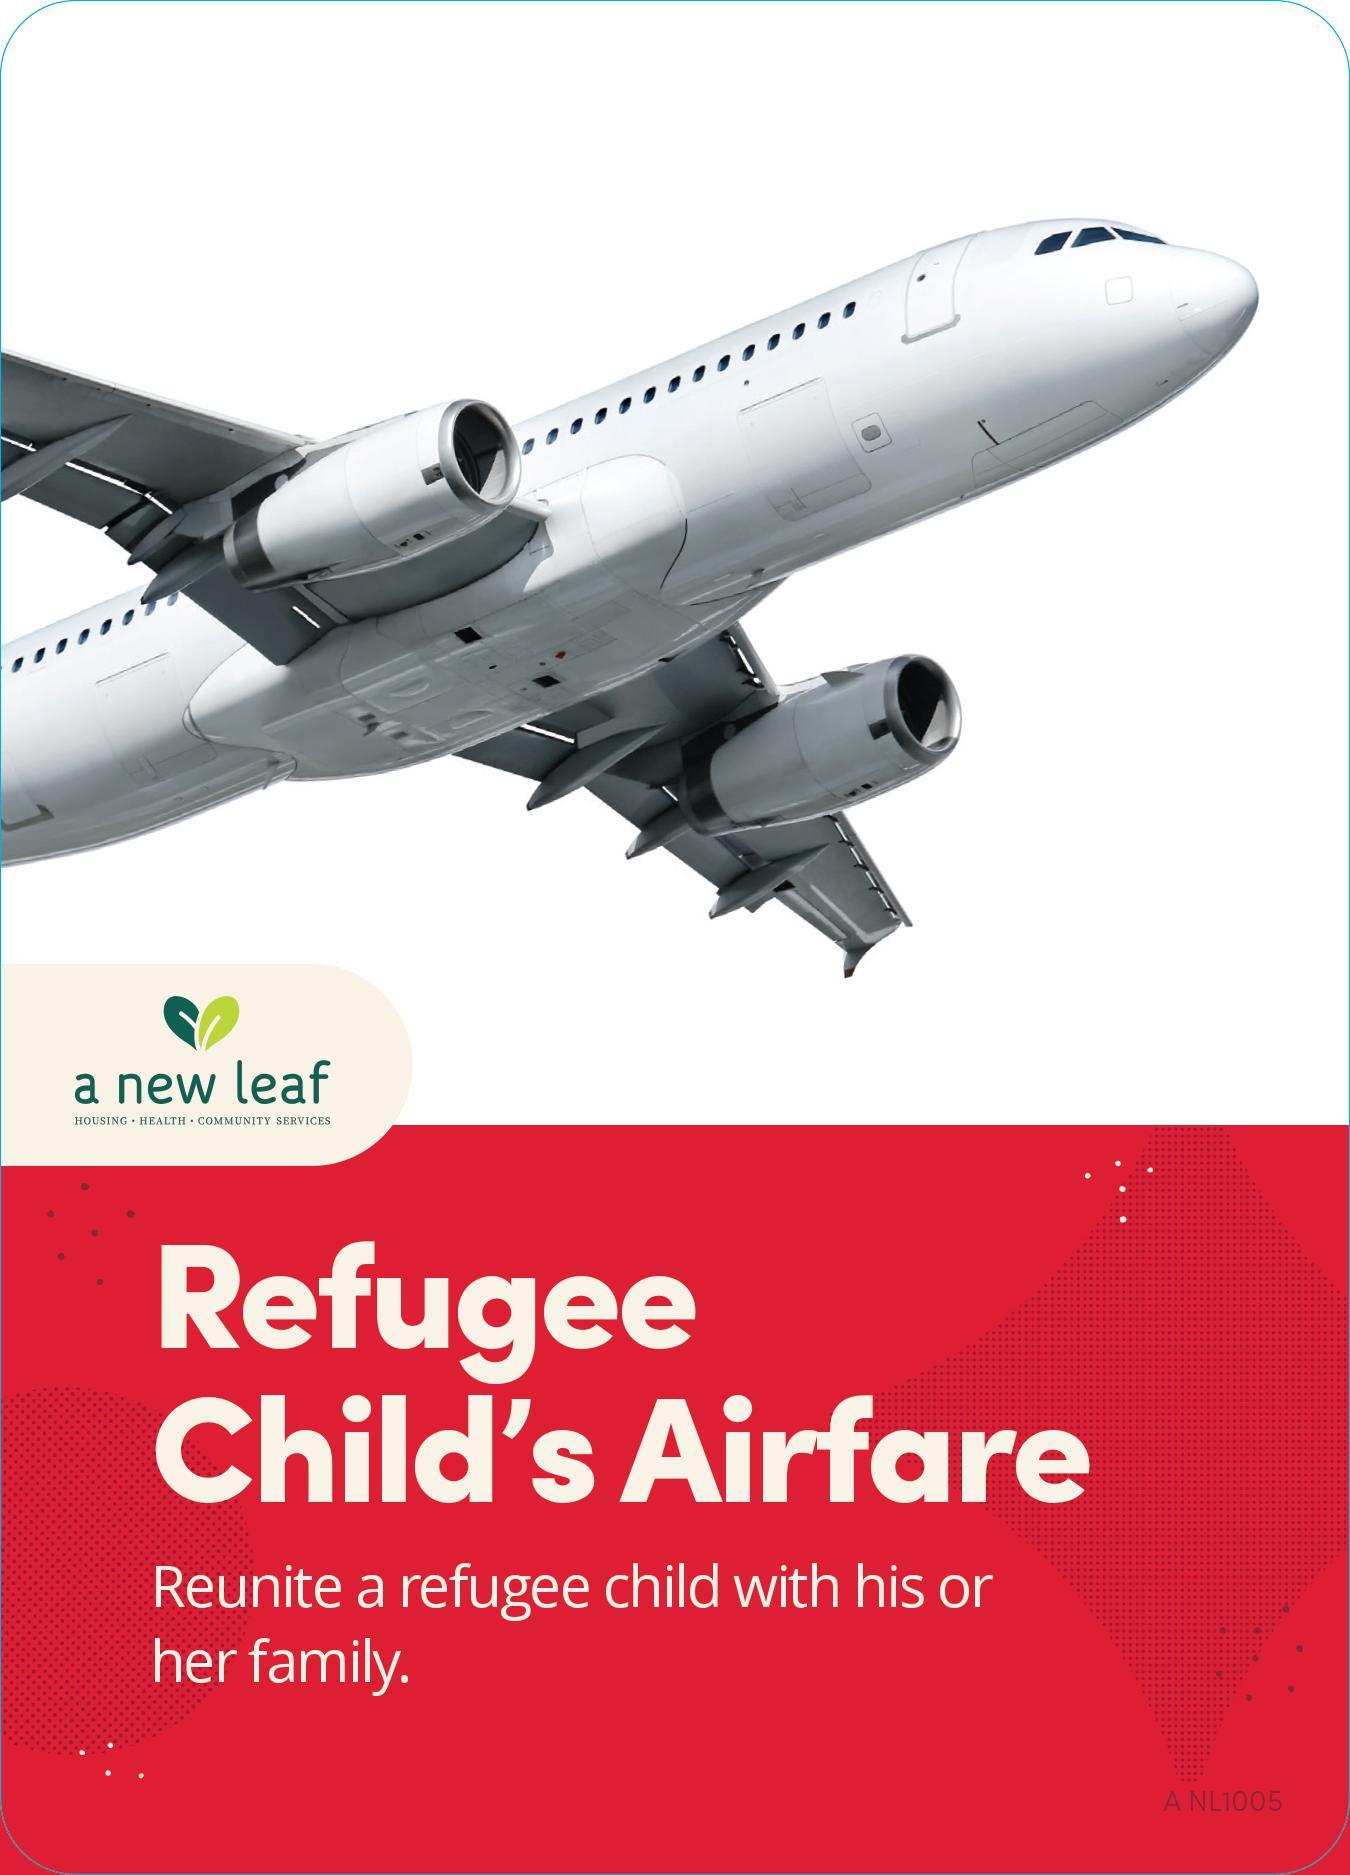 $100 - Reunite a Refugee Child with Family